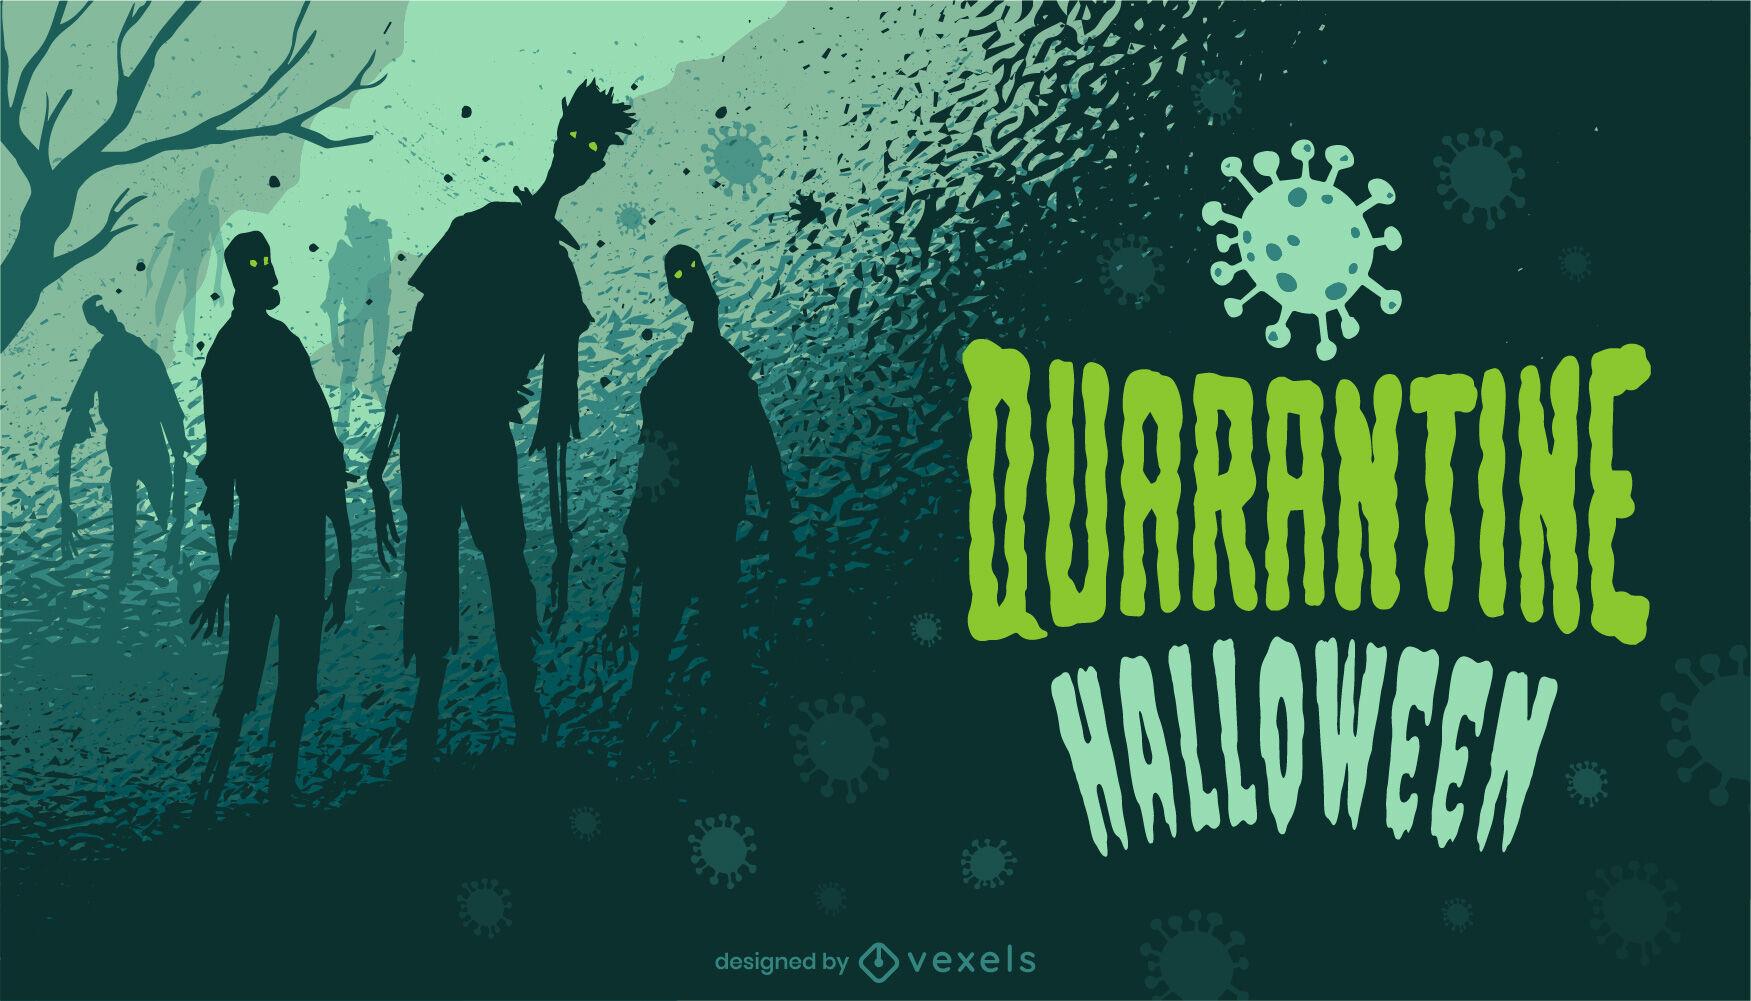 Quarantine zombie halloween illustration